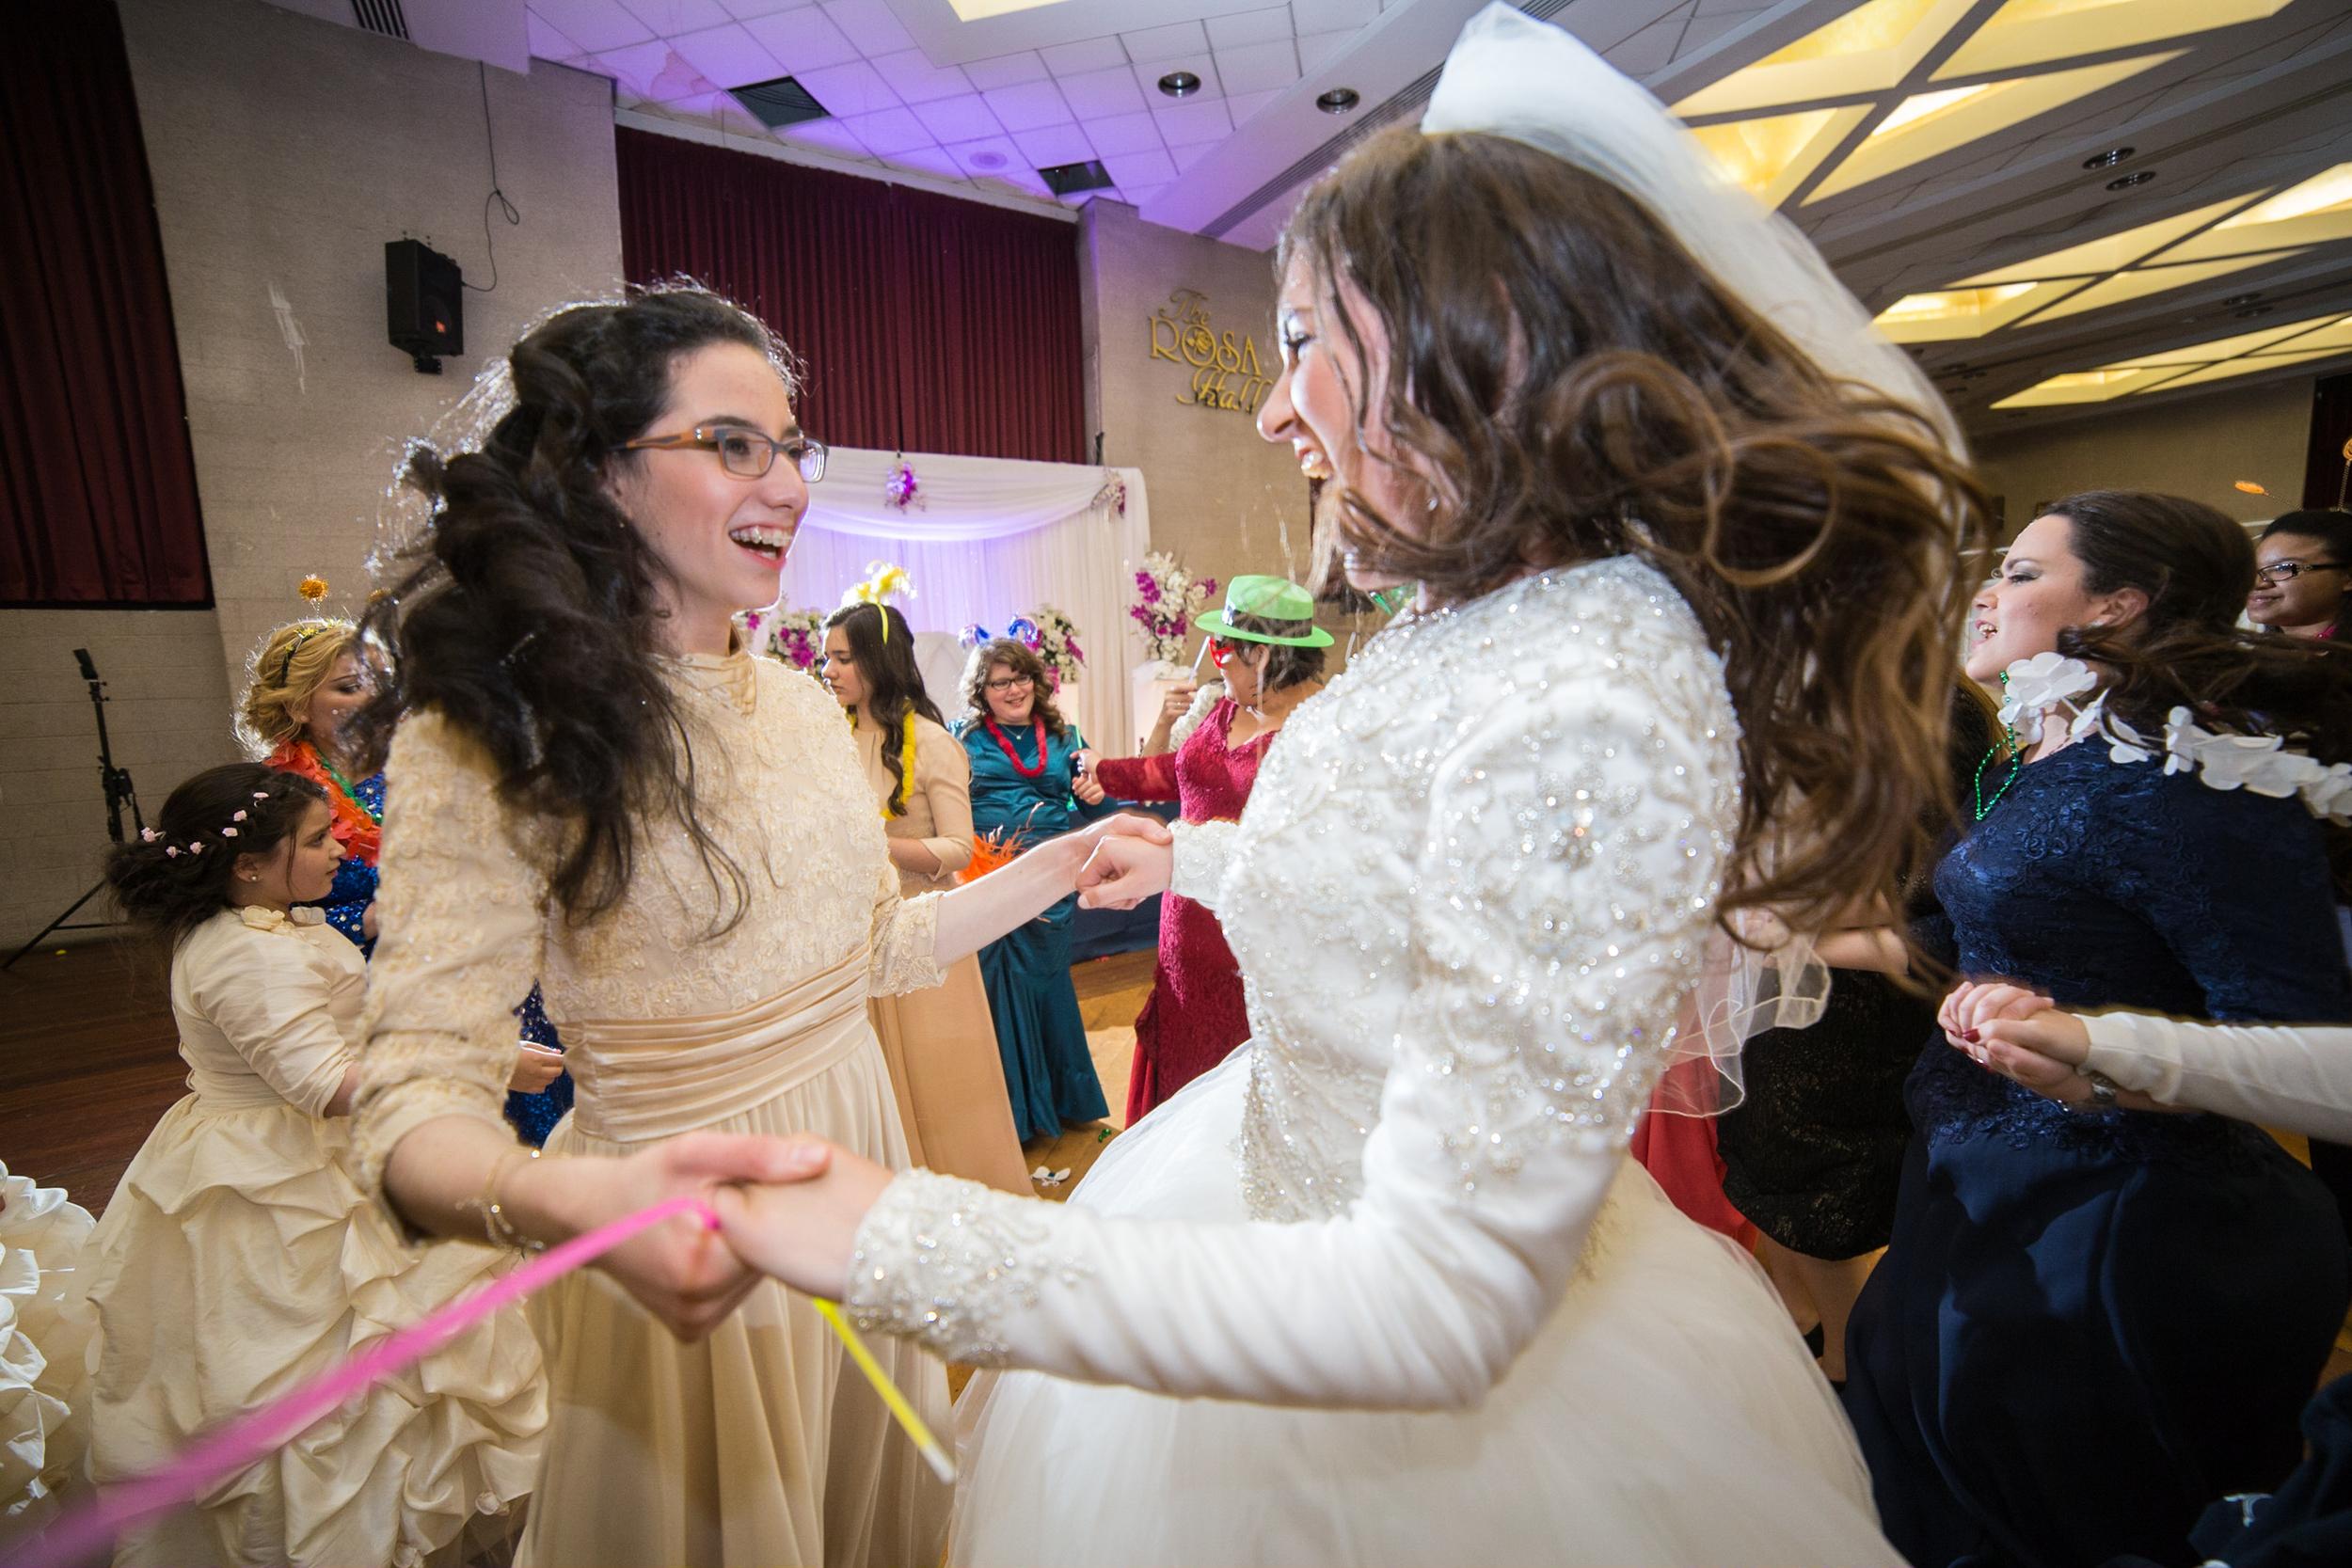 Wedding Iossi and Gitty Khafif  - Eliau Piha studio photography, new york, events, people 770 brooklyn -0859.jpg